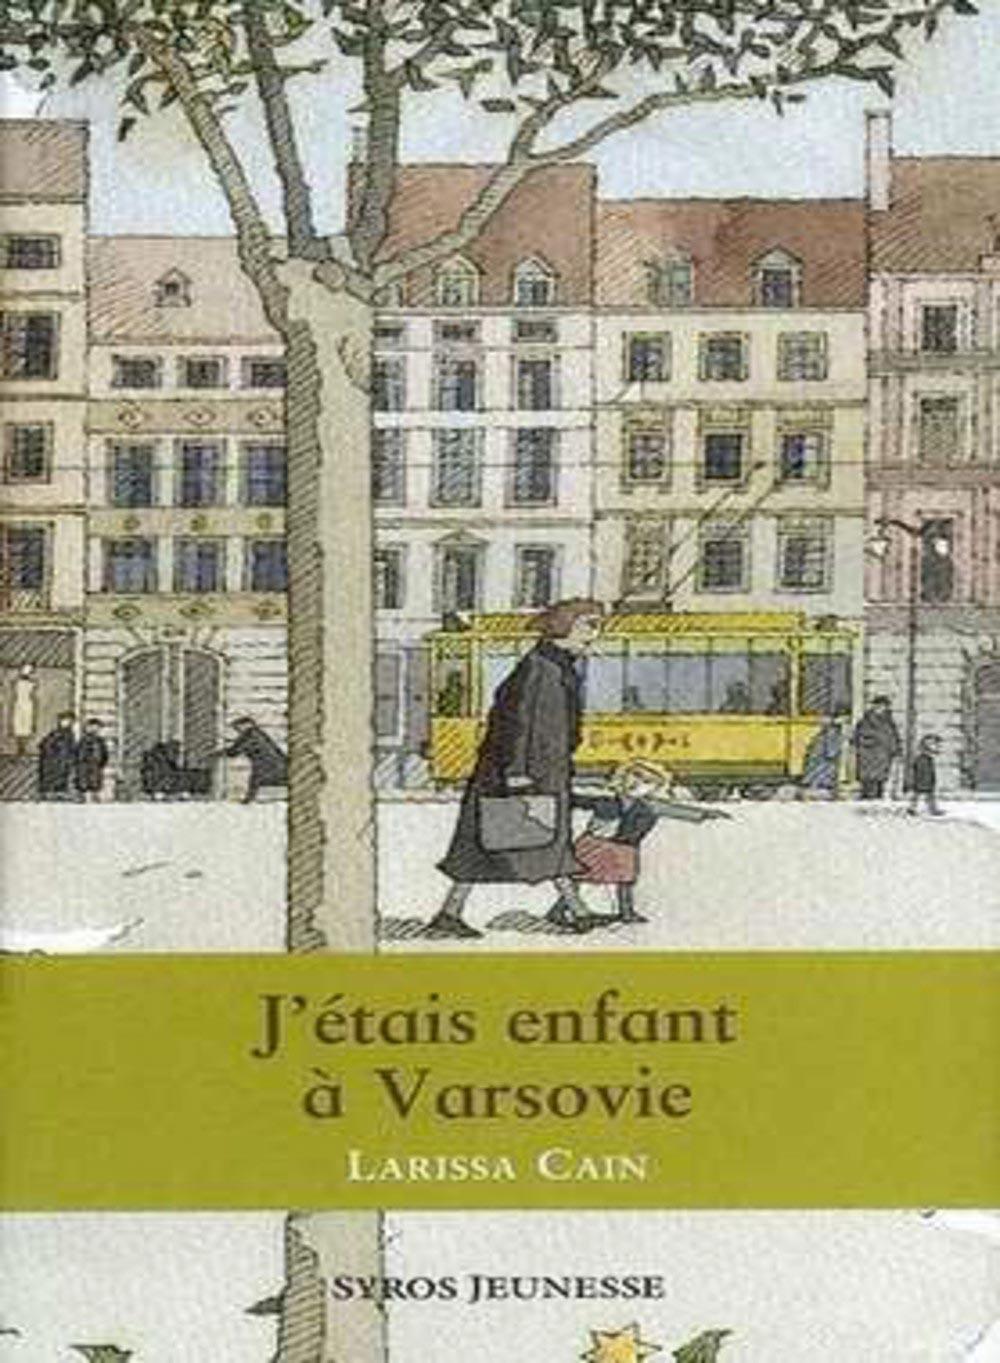 J'étais enfant à Varsovie